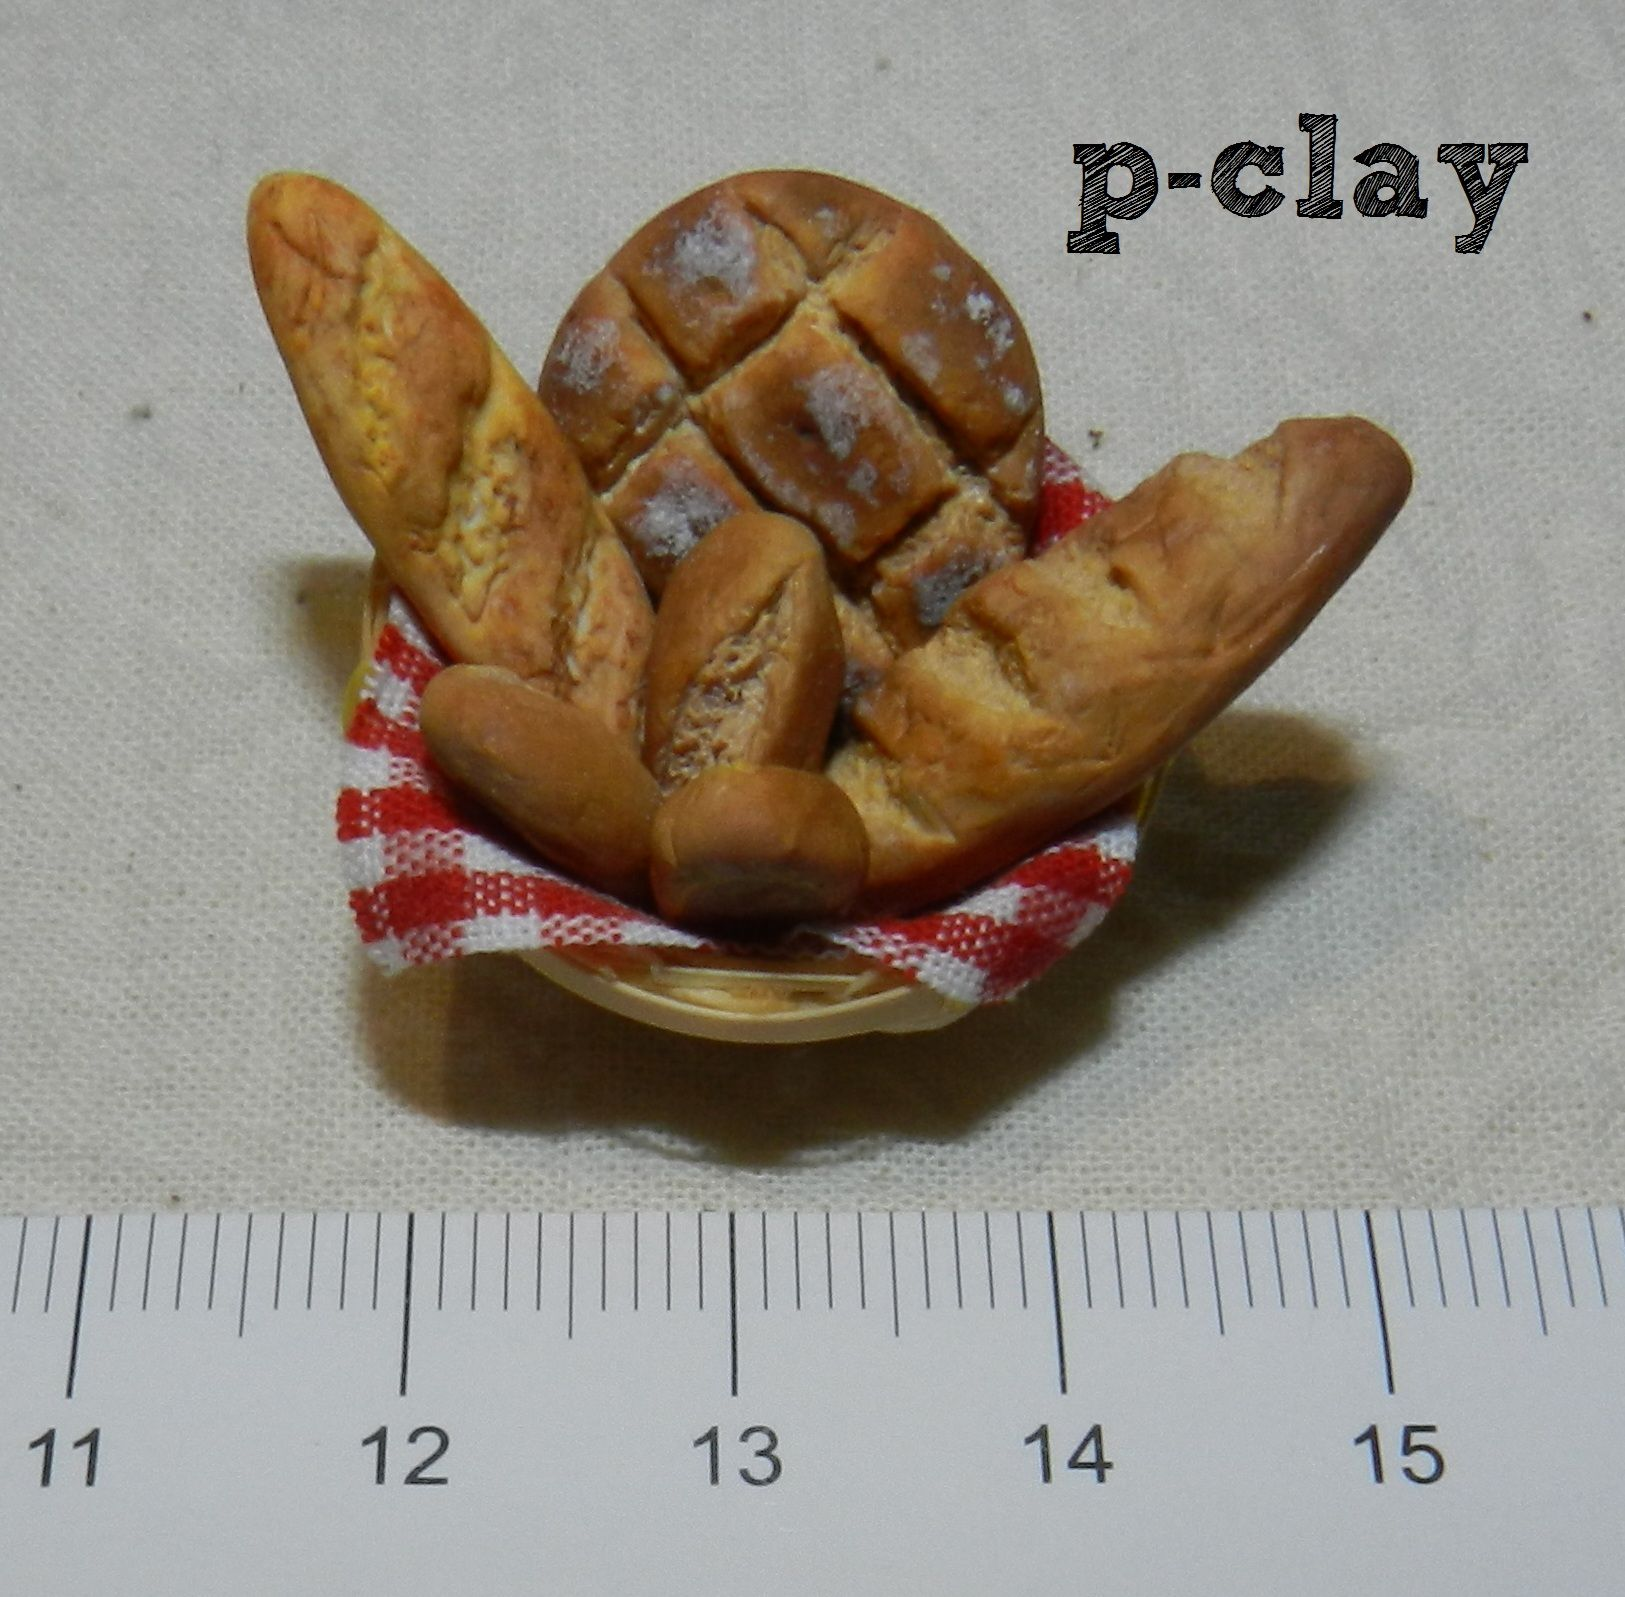 Basket of freshly baked bread (polymer clay miniature). Cesta de pan (arcilla polimérica, miniatura).